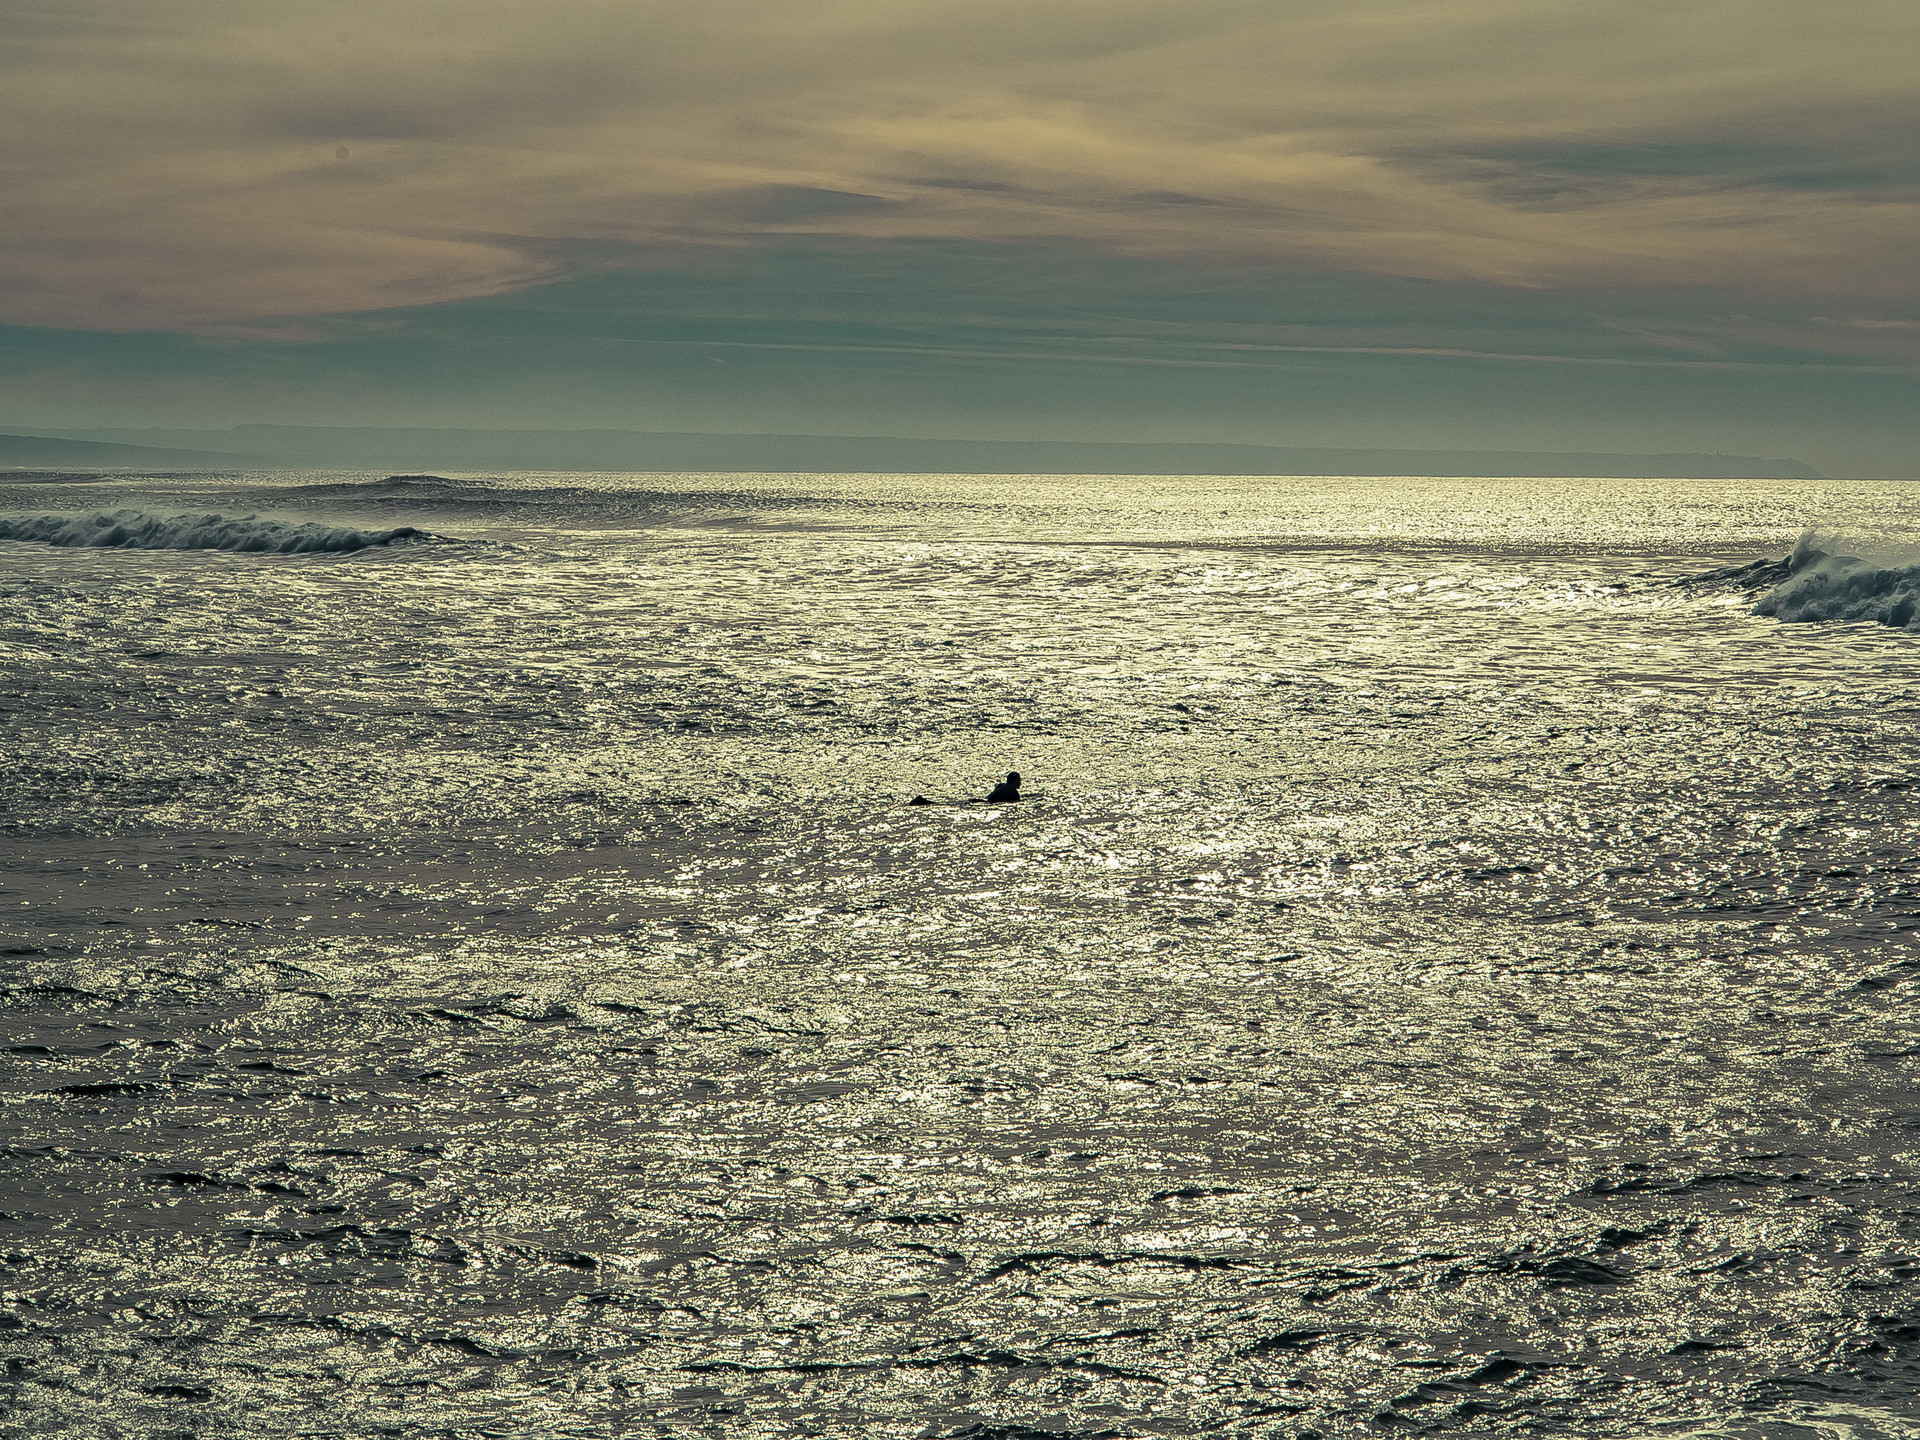 surfing-lisbon-3f61fcd6435aea66544bf3d18